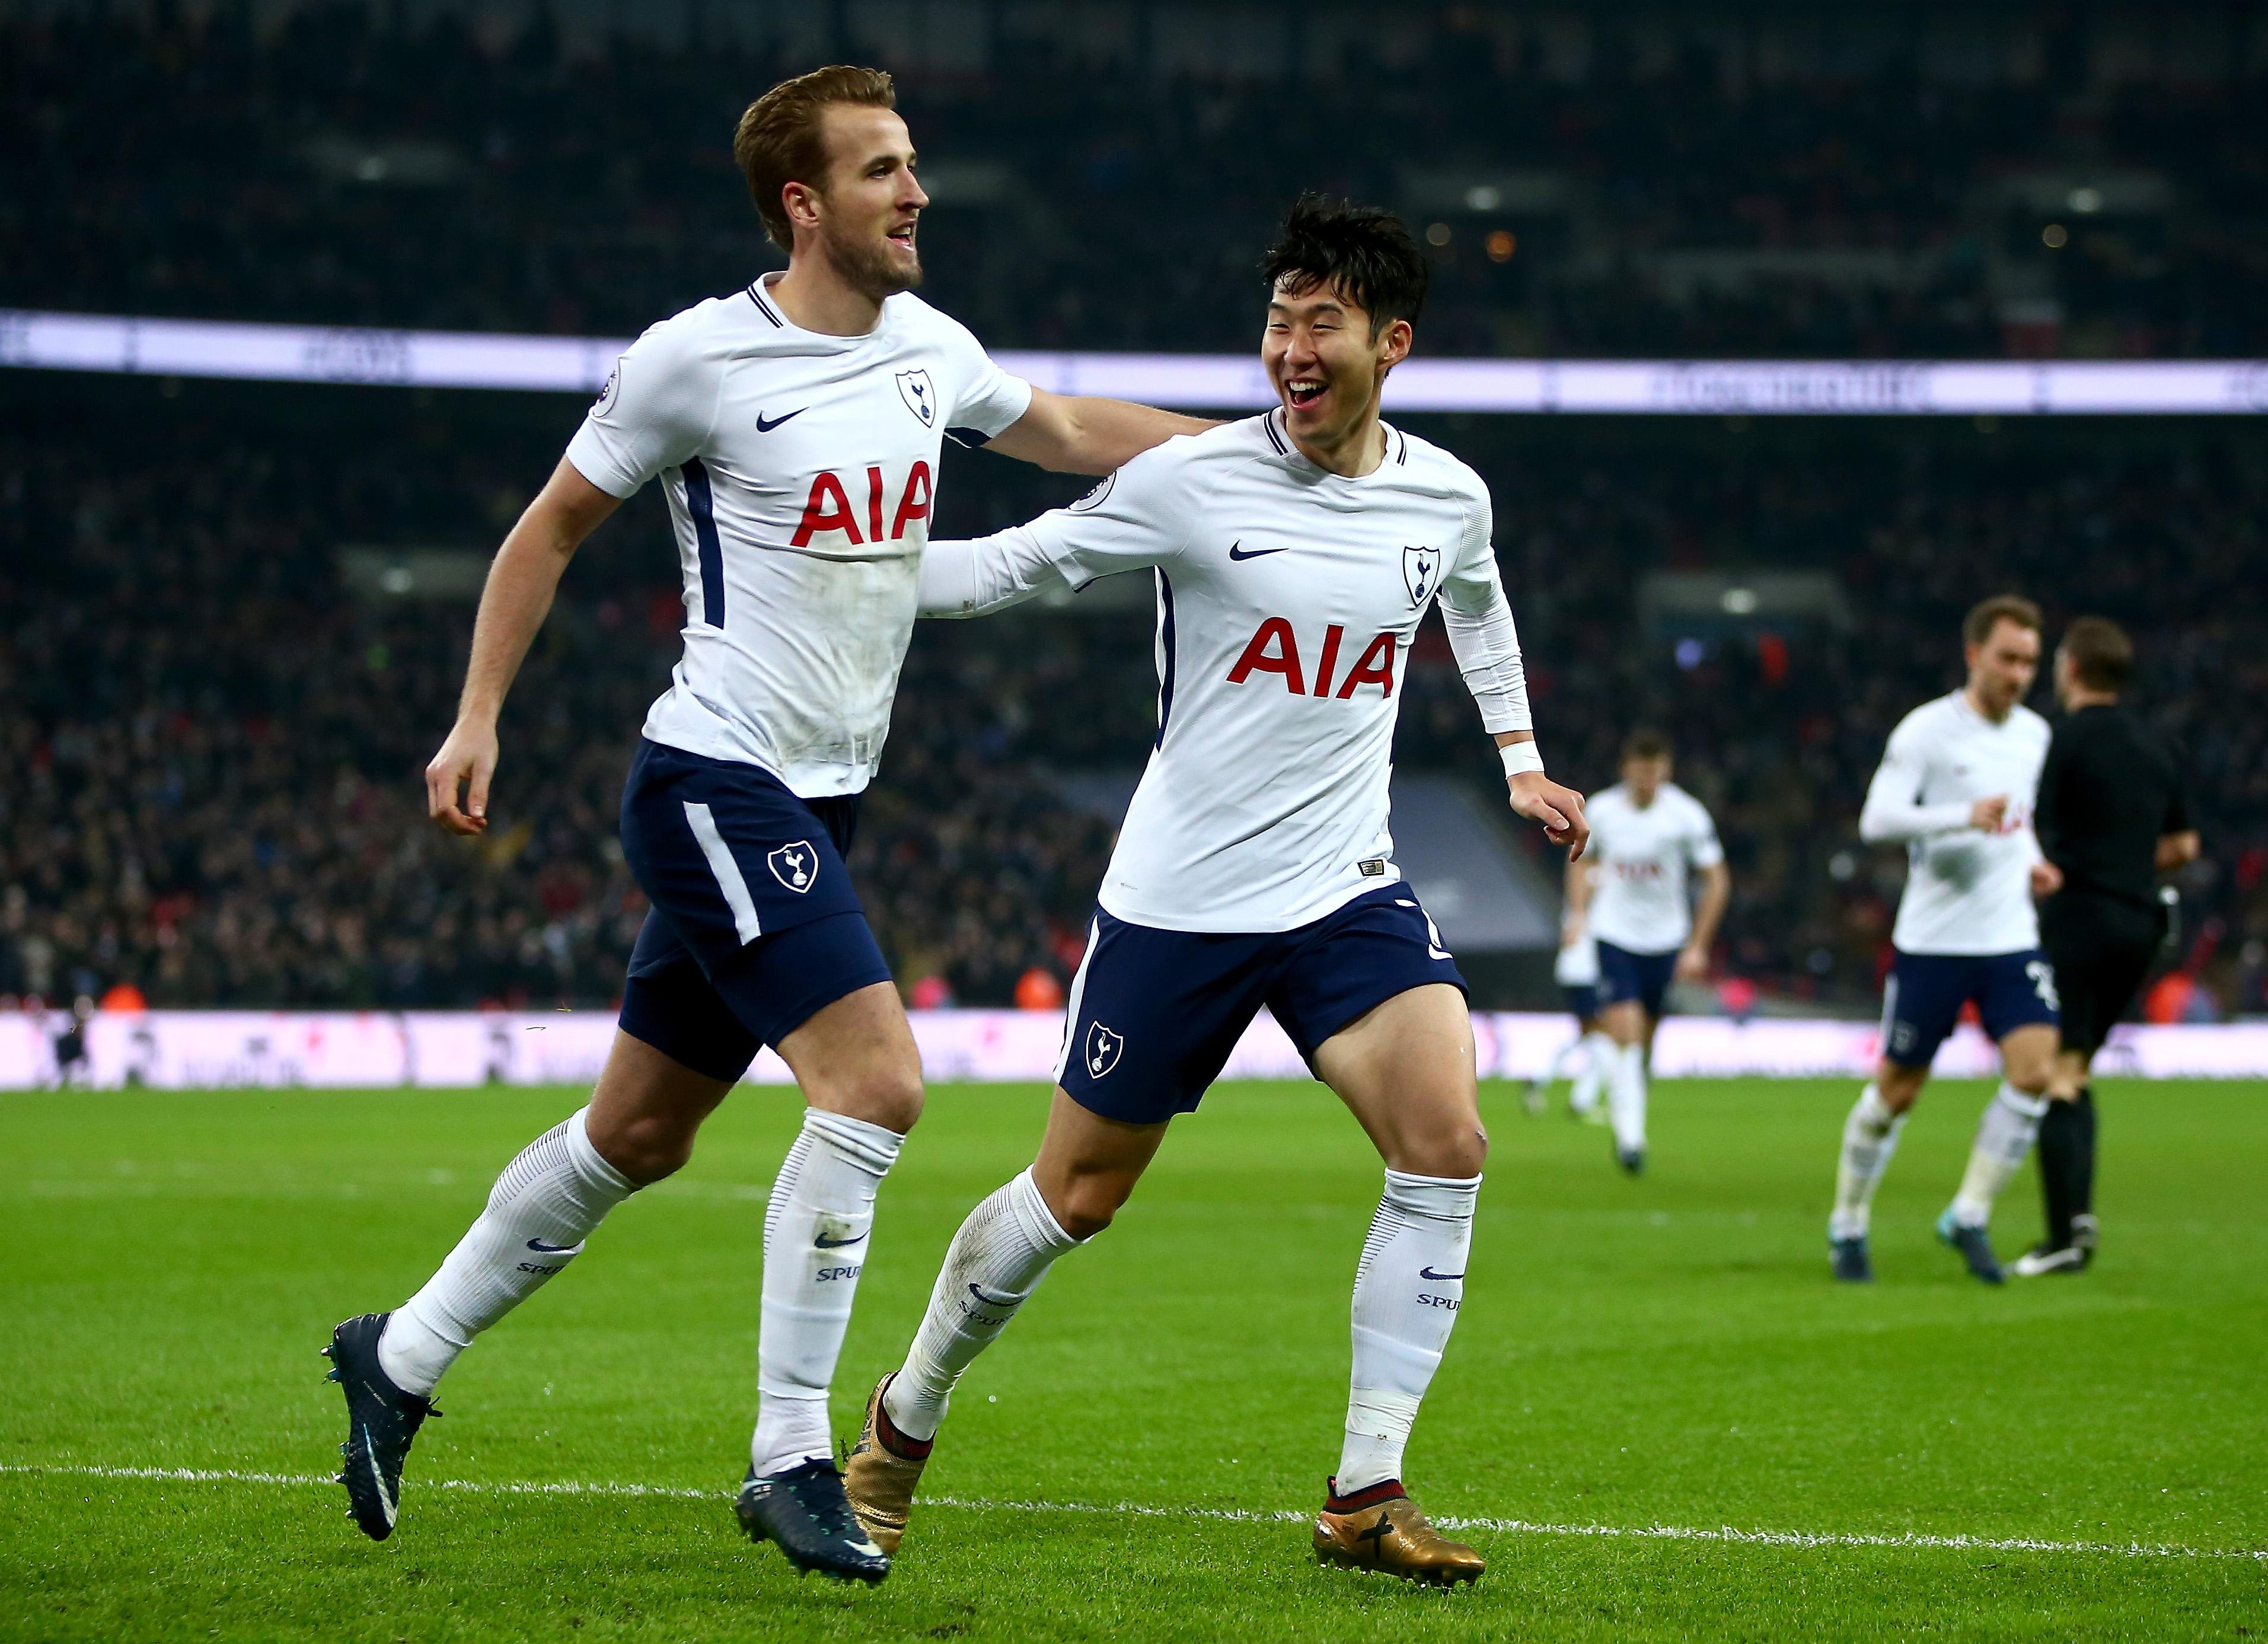 Tottenham vs Chelsea - live: All square as Eden Hazard ...  |Tottenham